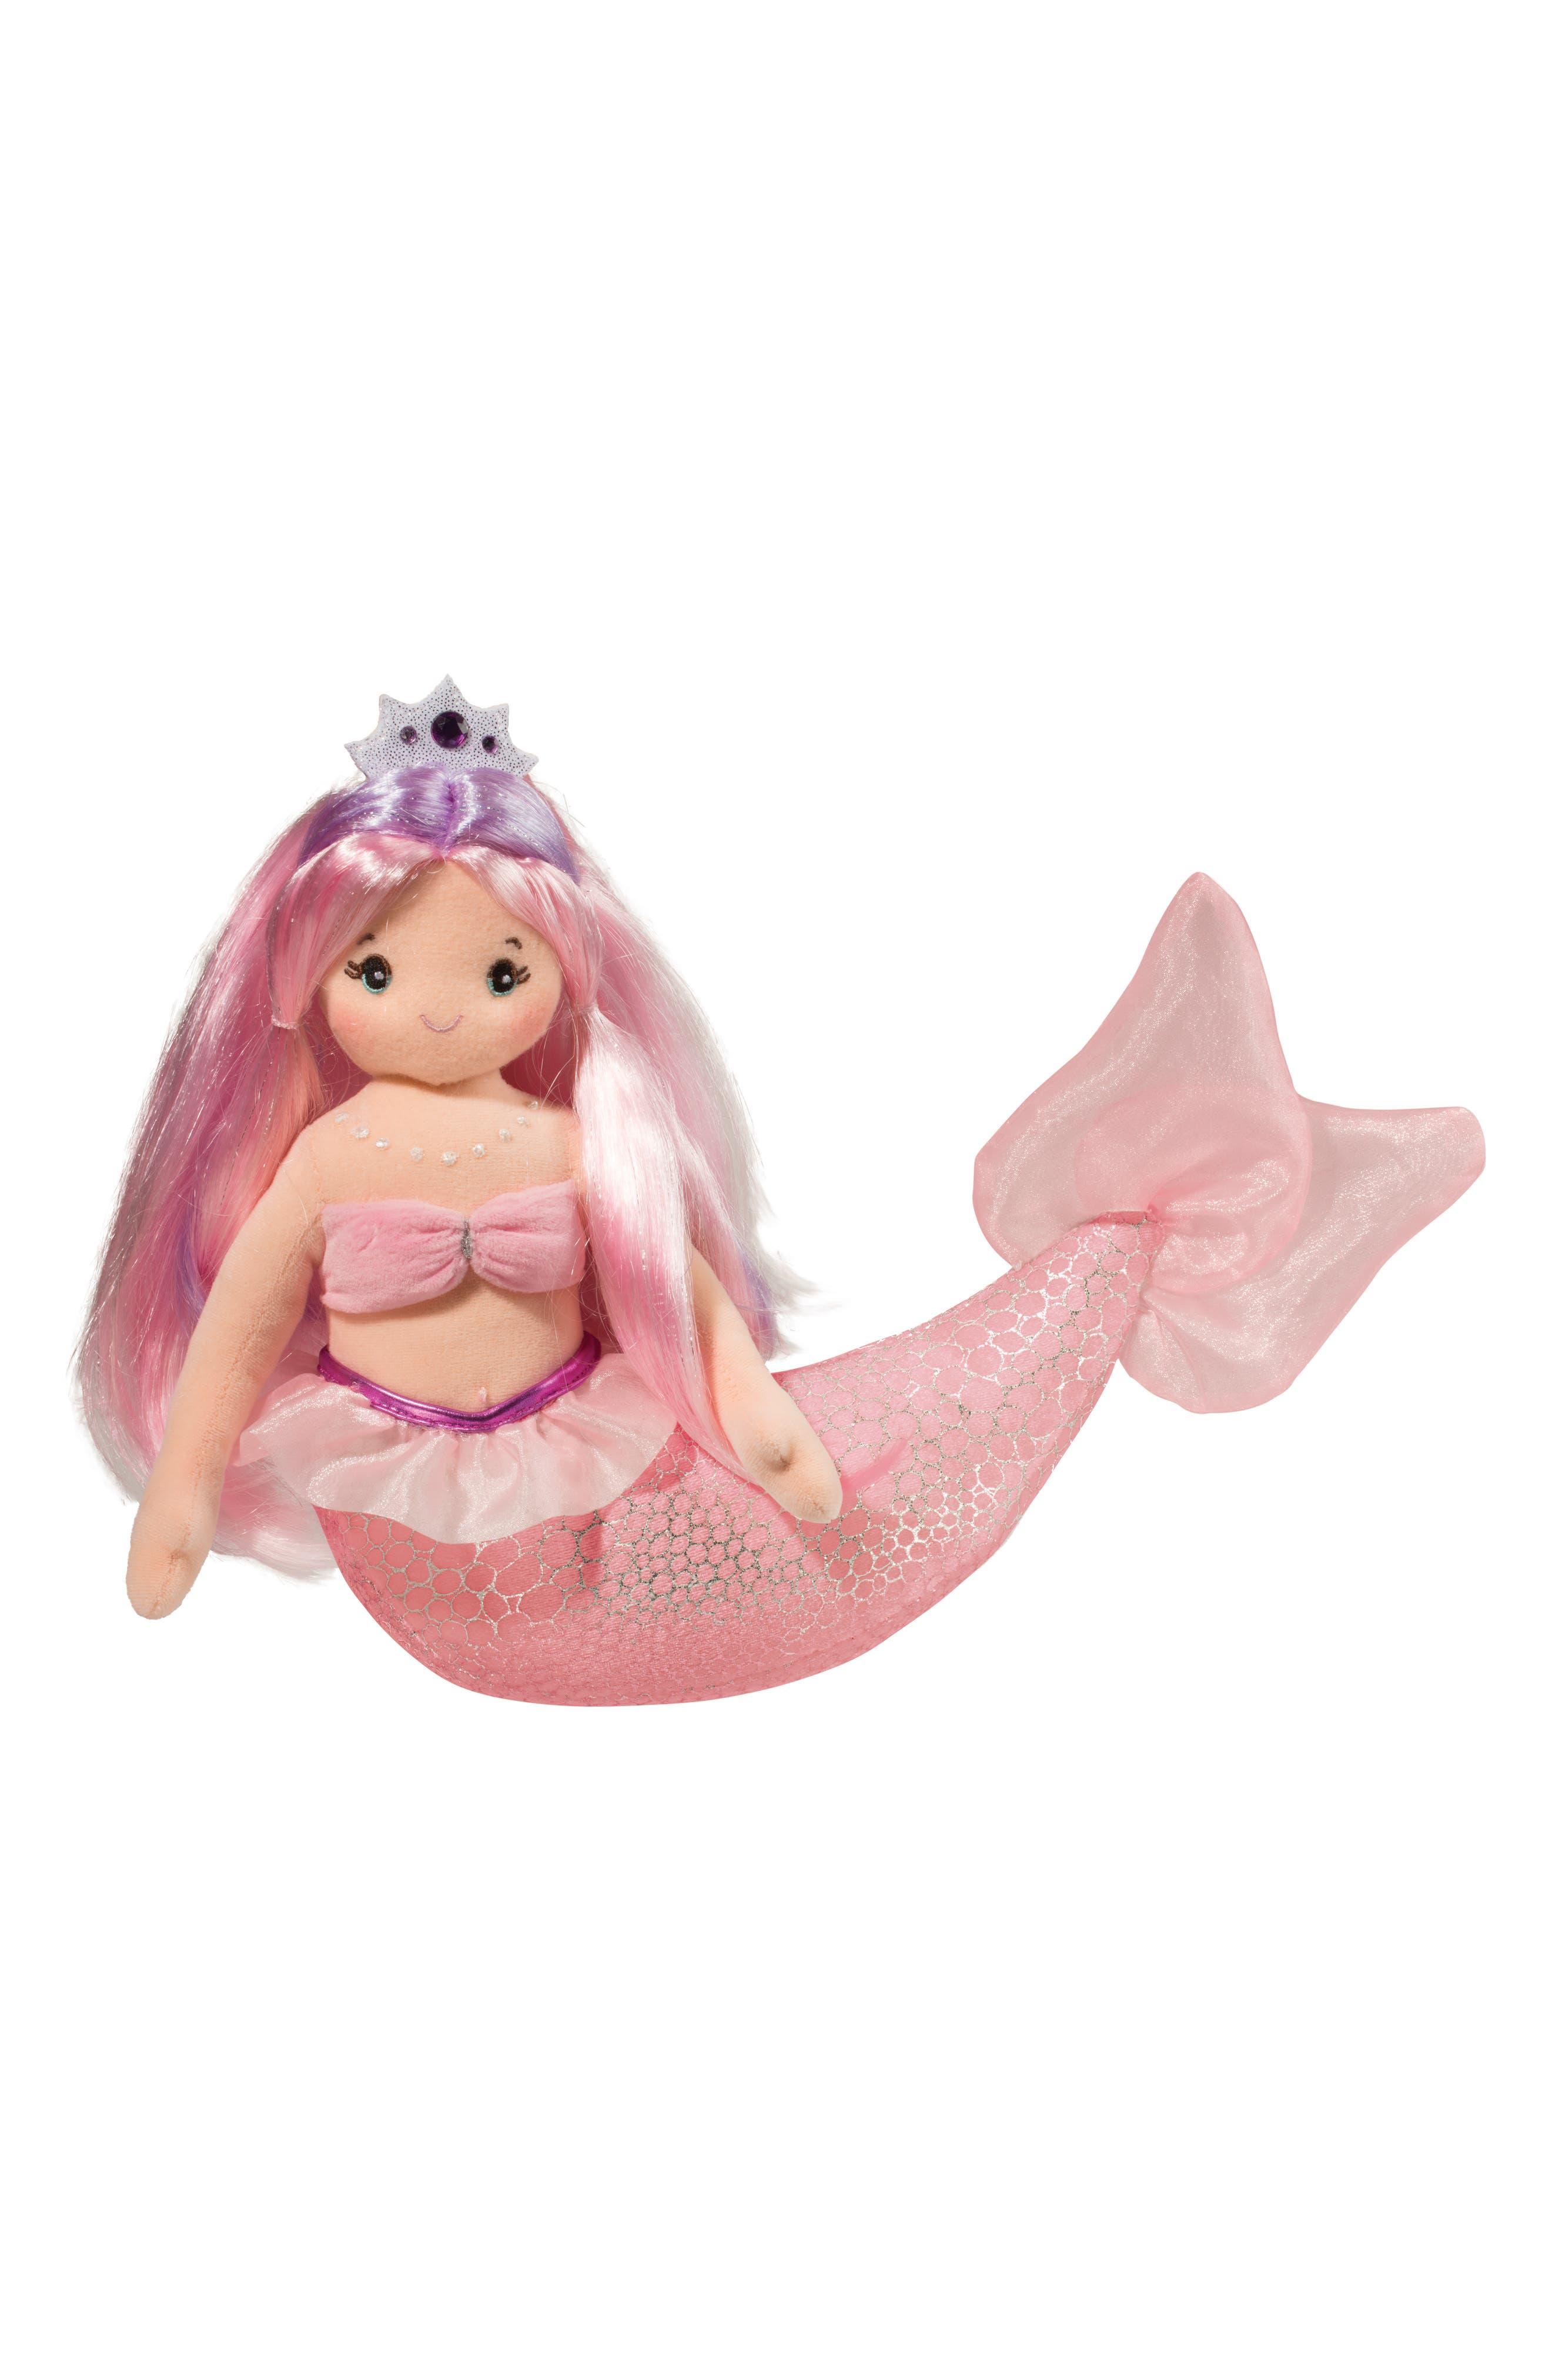 Douglas Serena - Large Pink Mermaid Doll